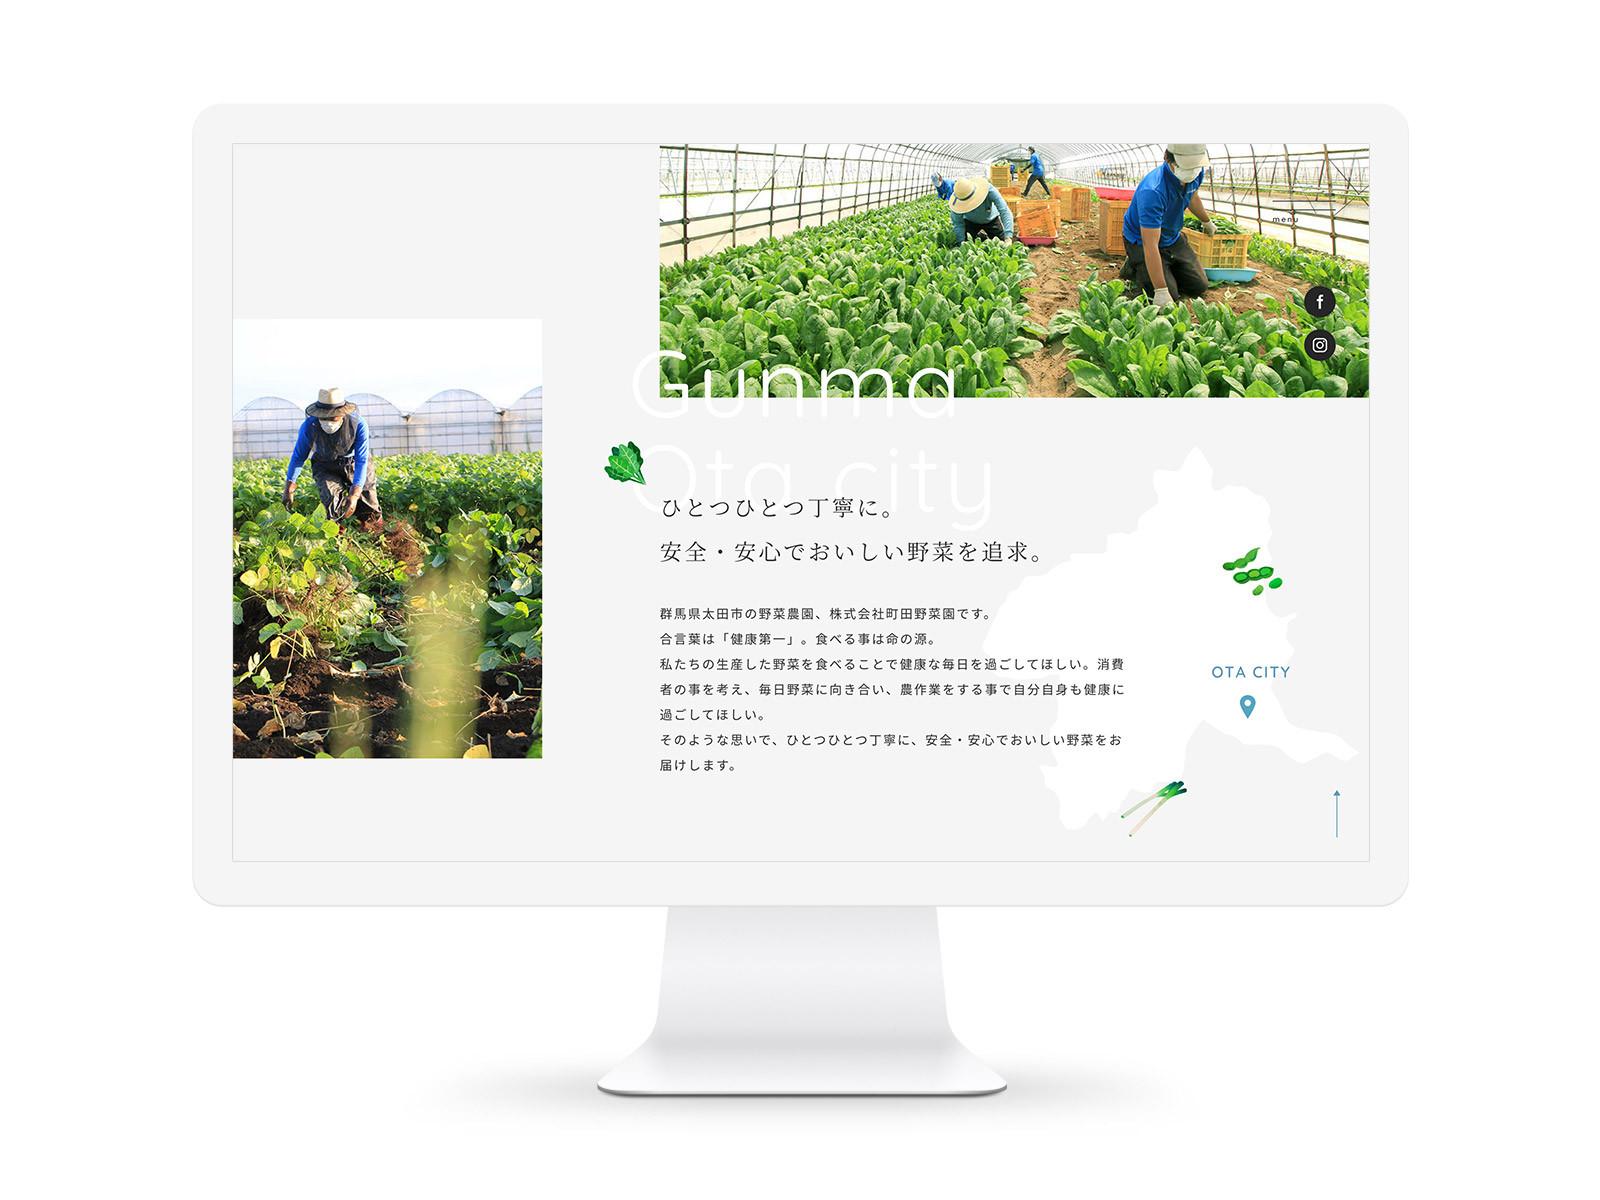 Machida Vegetable Farm image